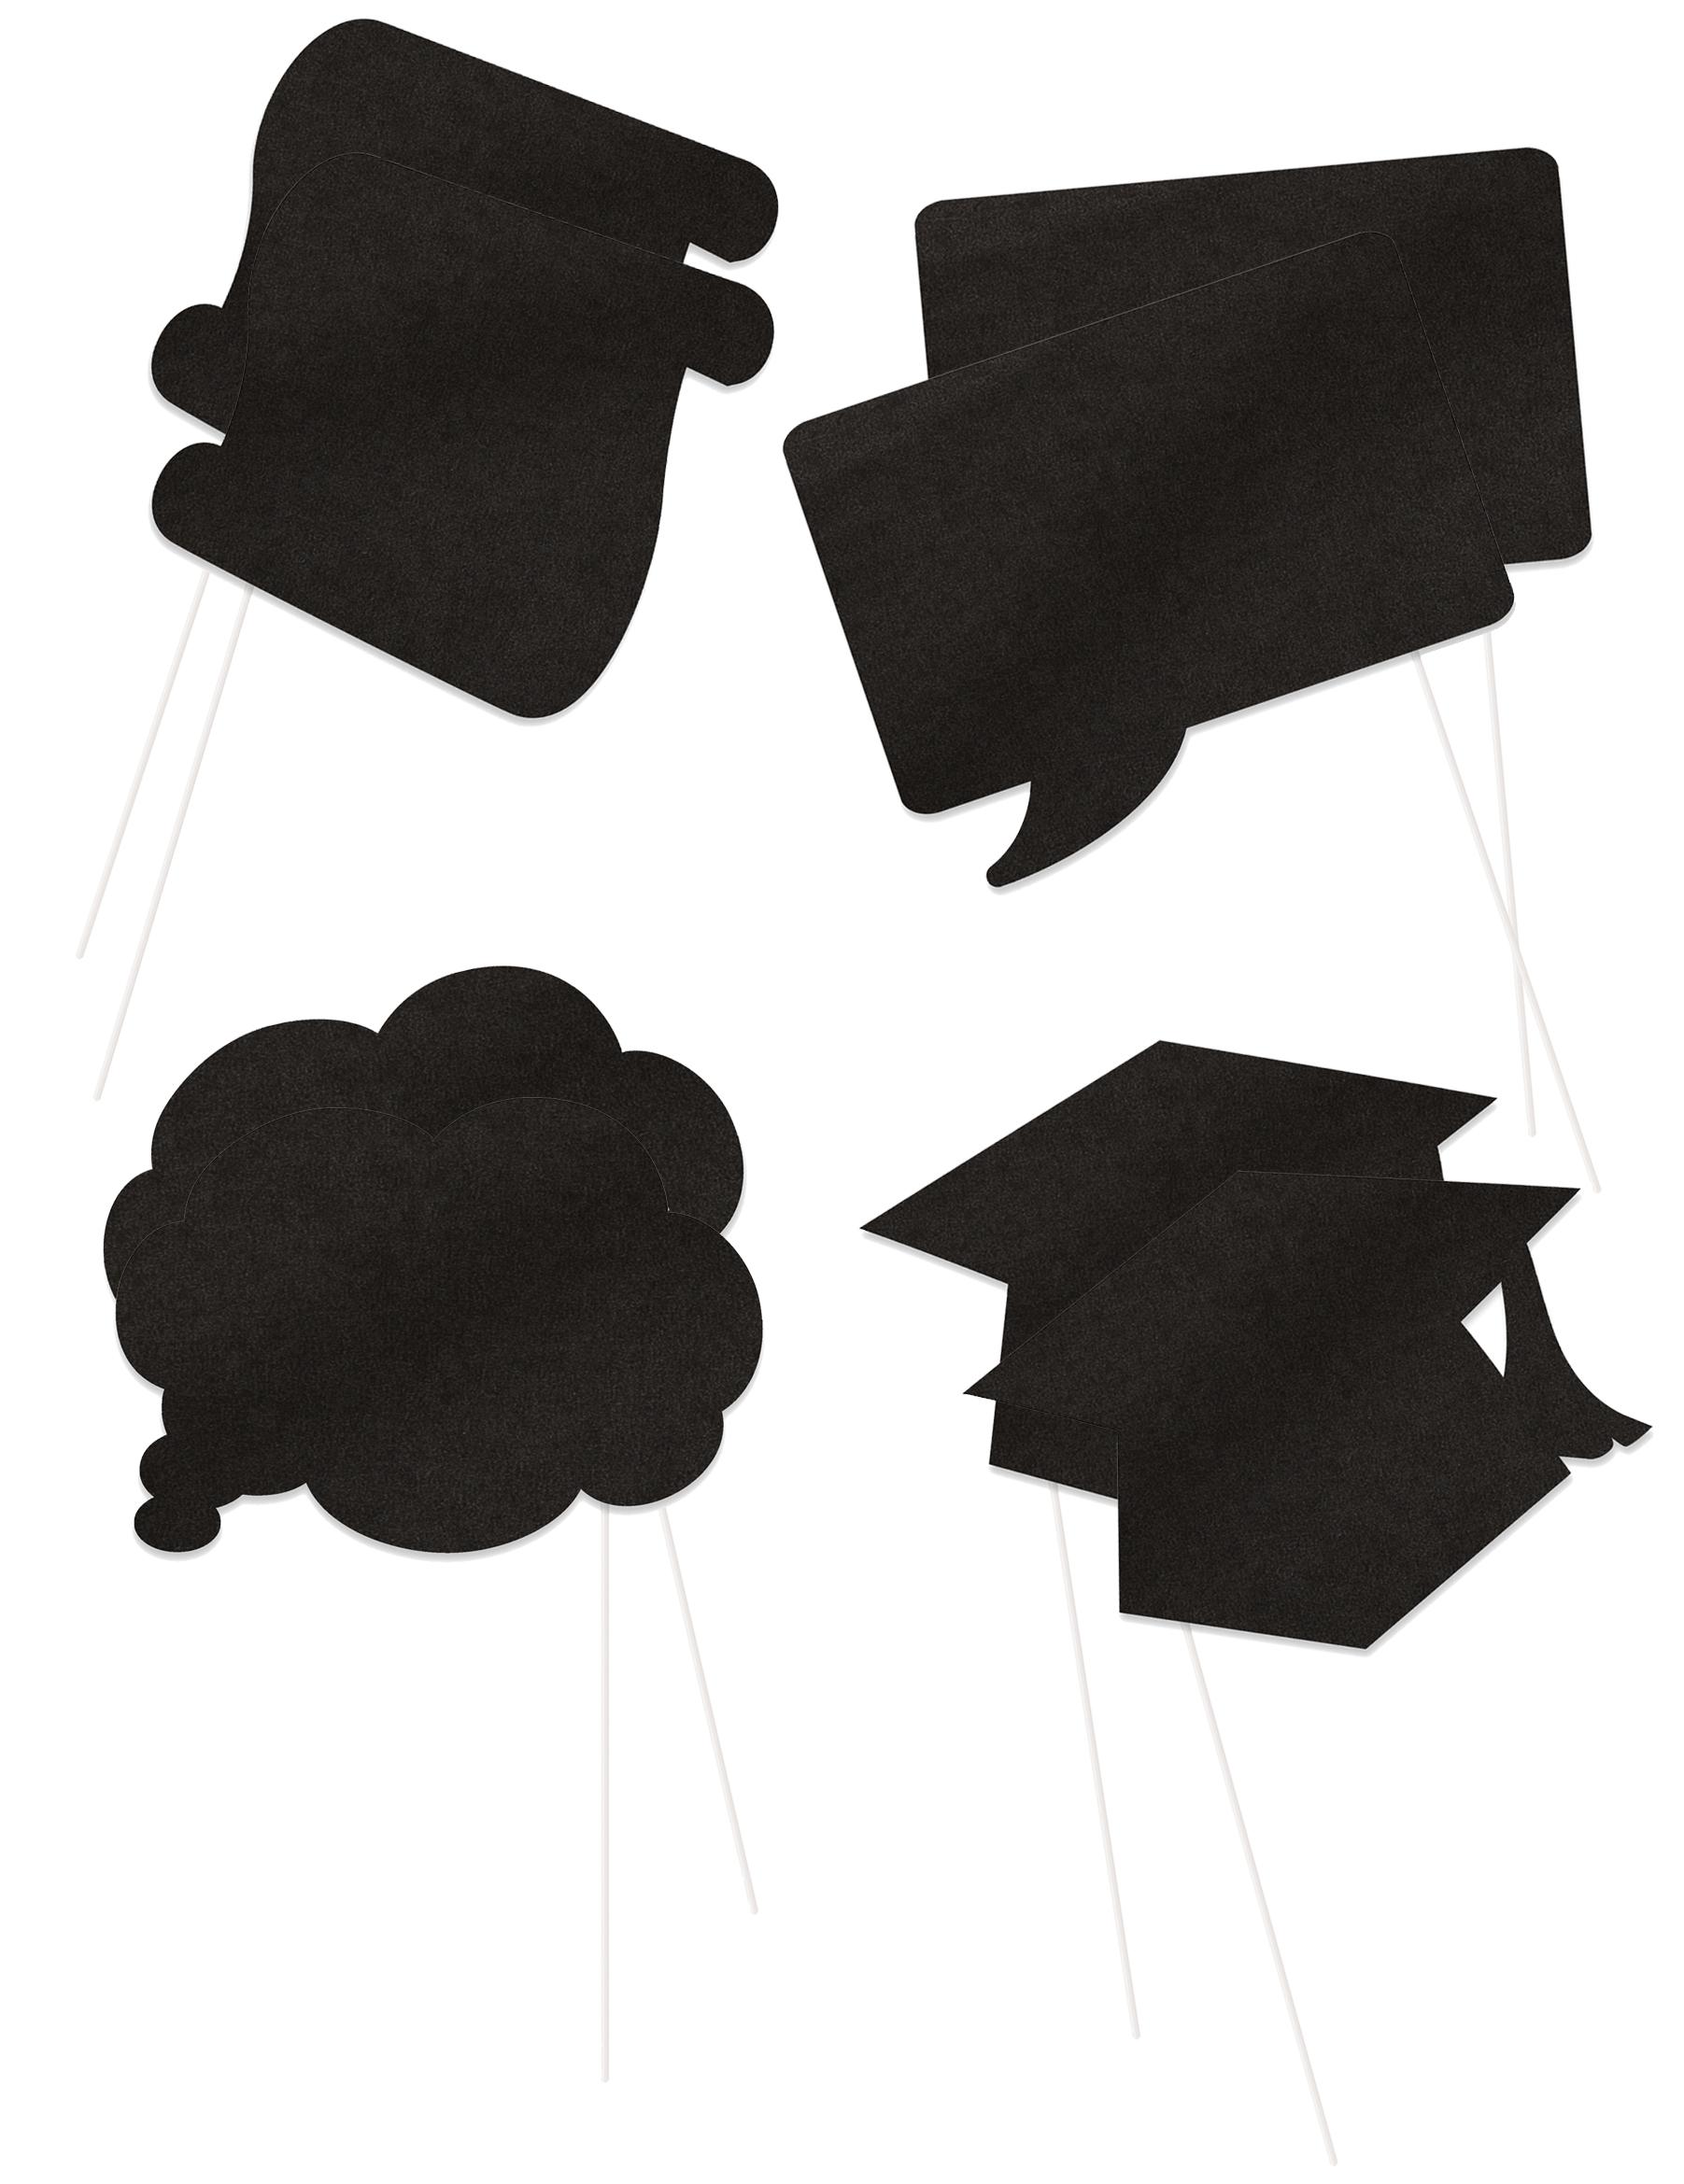 lustiges diplomand set f r fotos 8 teilig schwarz 16x13cm g nstige faschings partydeko. Black Bedroom Furniture Sets. Home Design Ideas